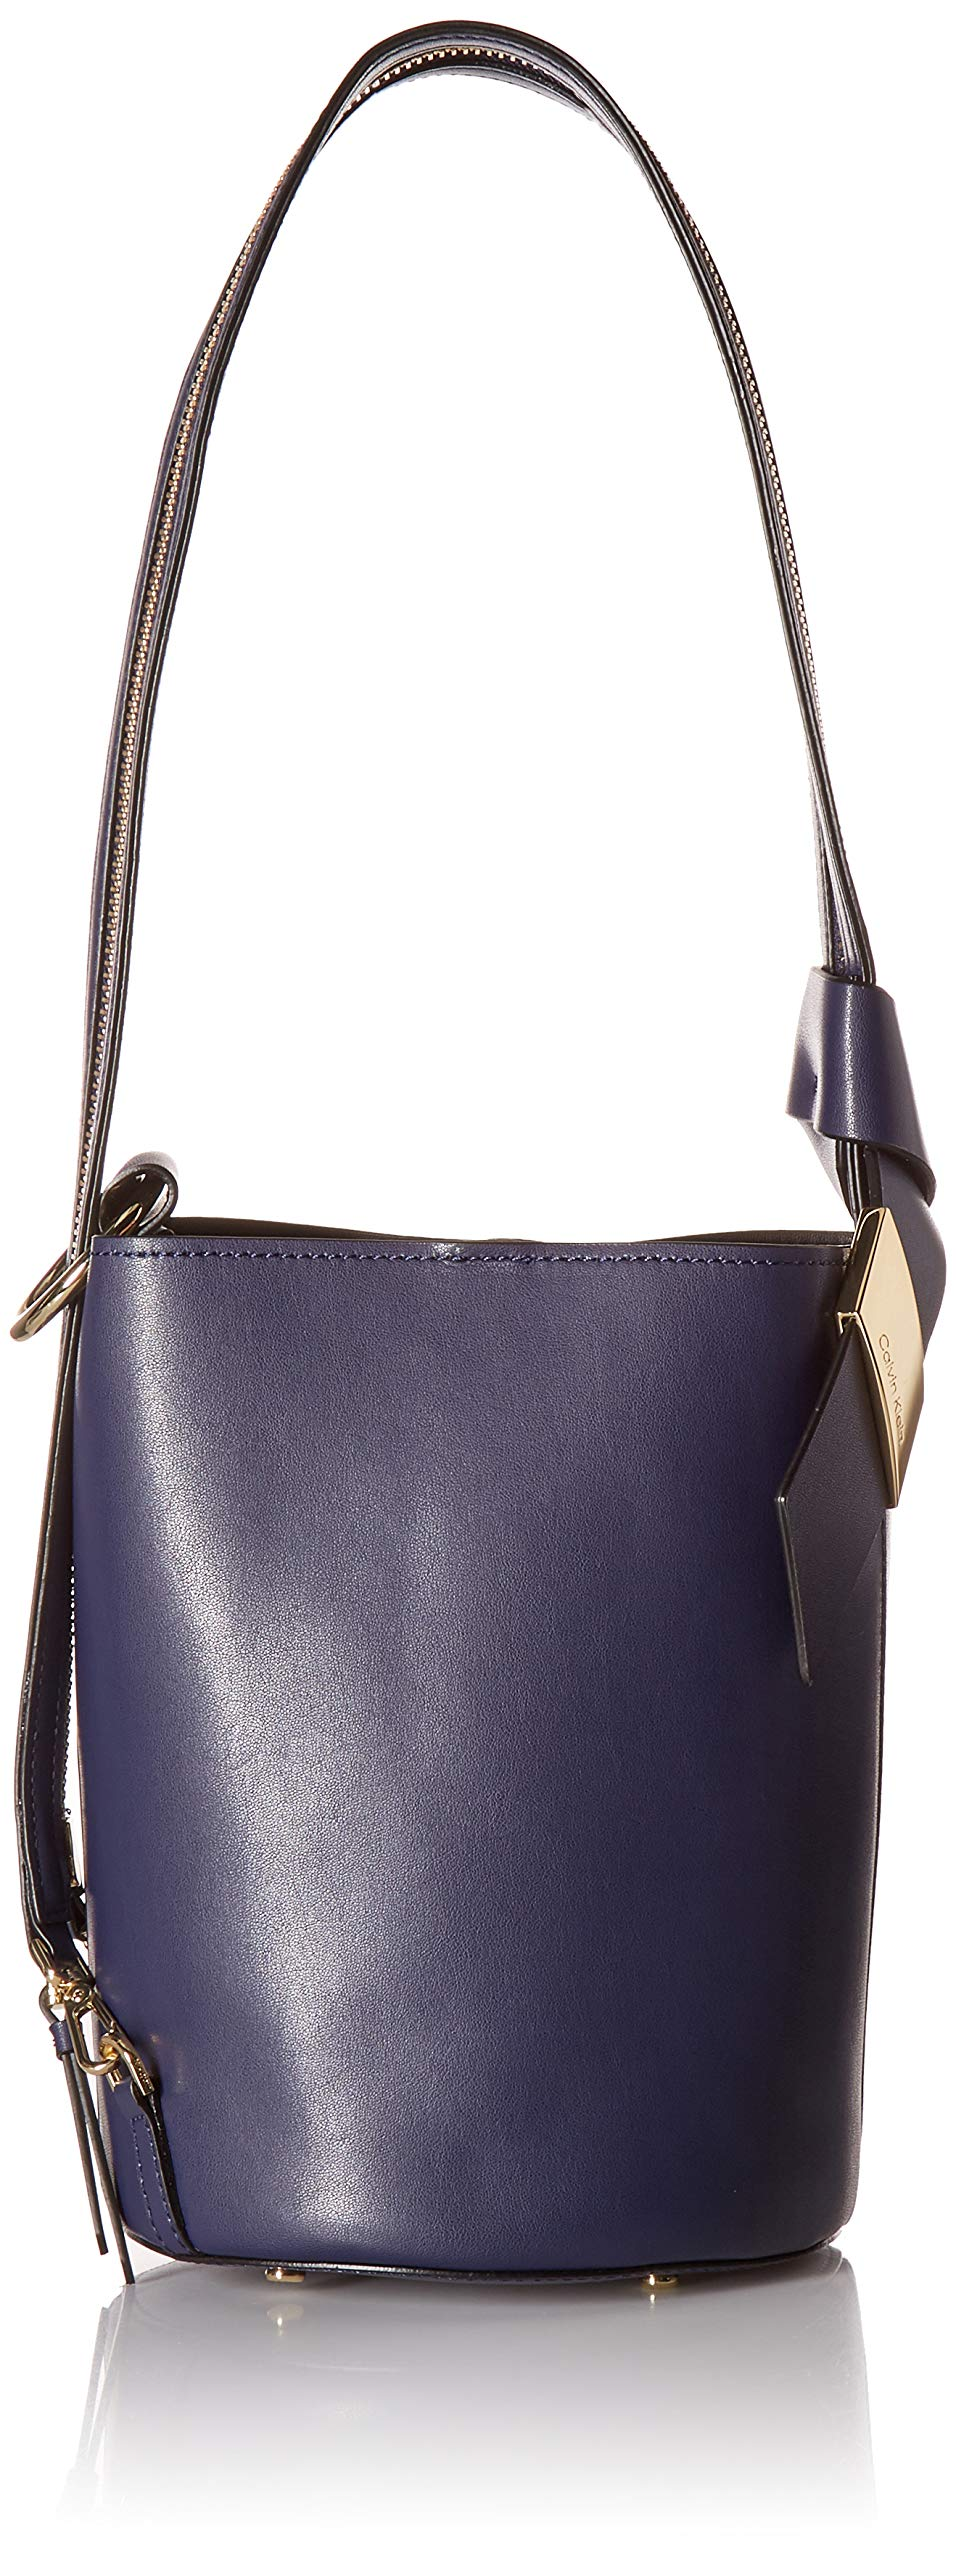 Calvin-Klein-Karsyn-Nappa-Leather-3-in-1-Convertible-Bucket